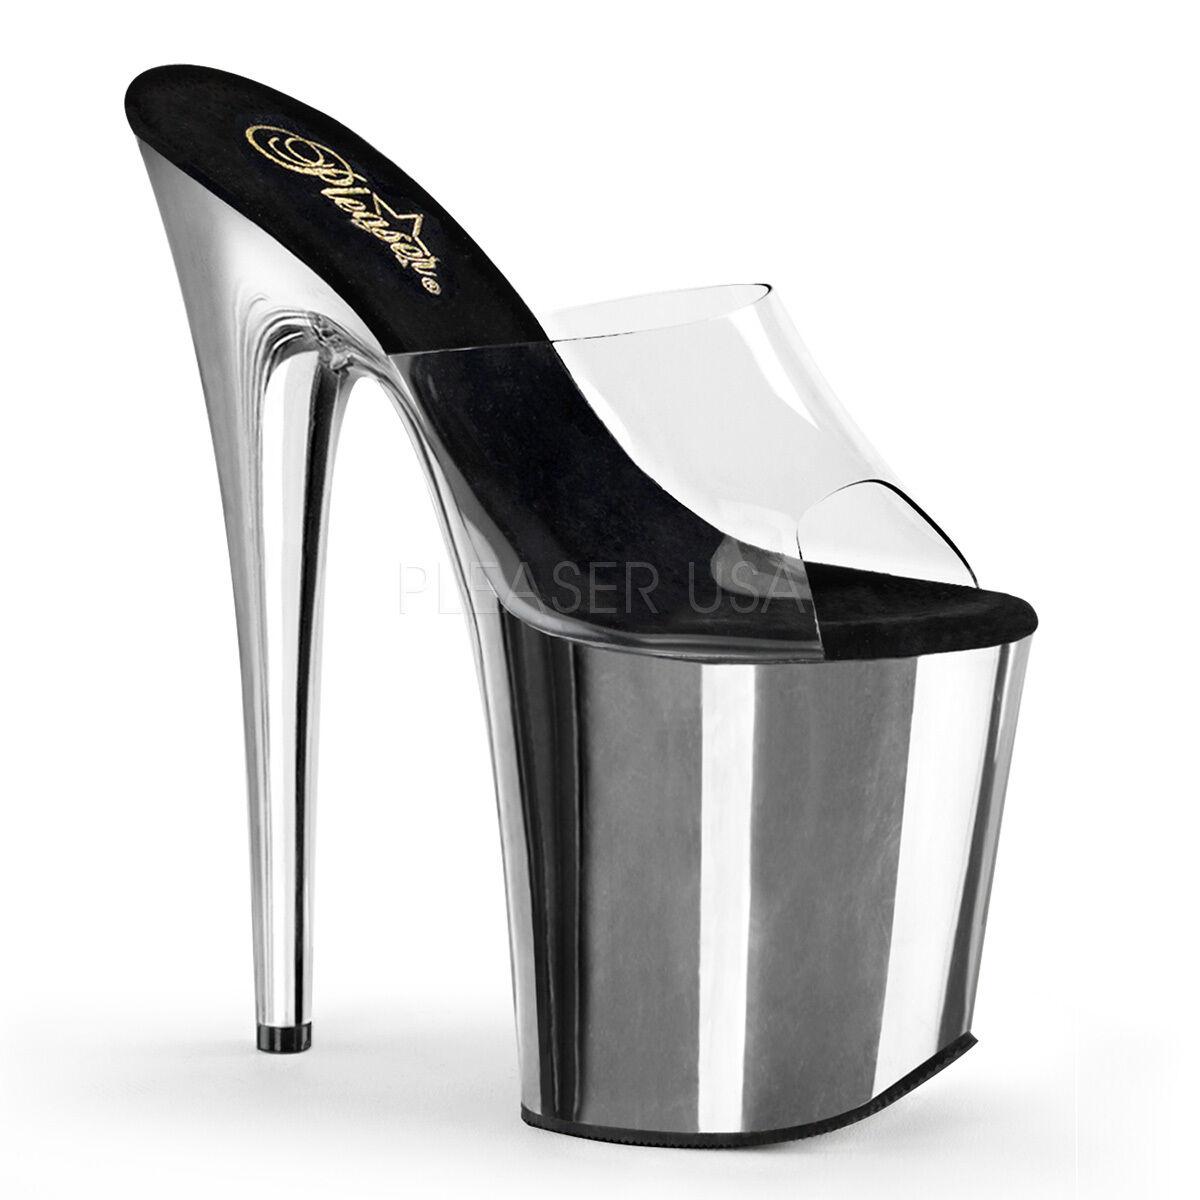 Sexy Silver Chrome Platform shoes 8  Stripper High Heels PLEASER FLAM801 C SCH